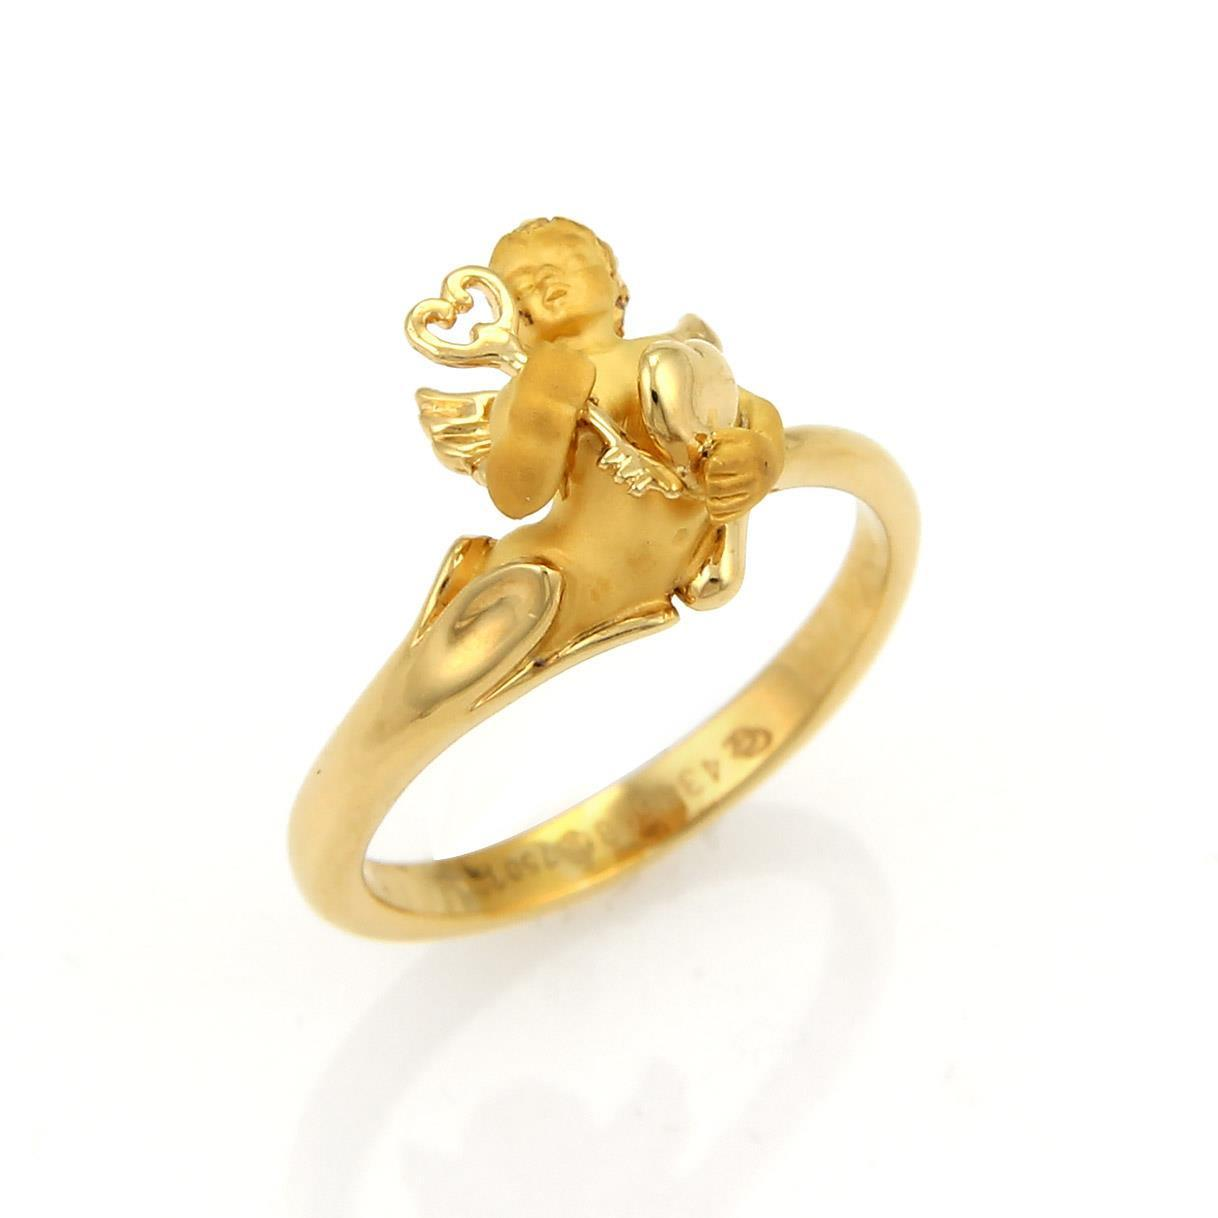 "Image of ""Carrera y Carrera 18K Yellow Gold 3D Cherub Ring Size 5.75"""